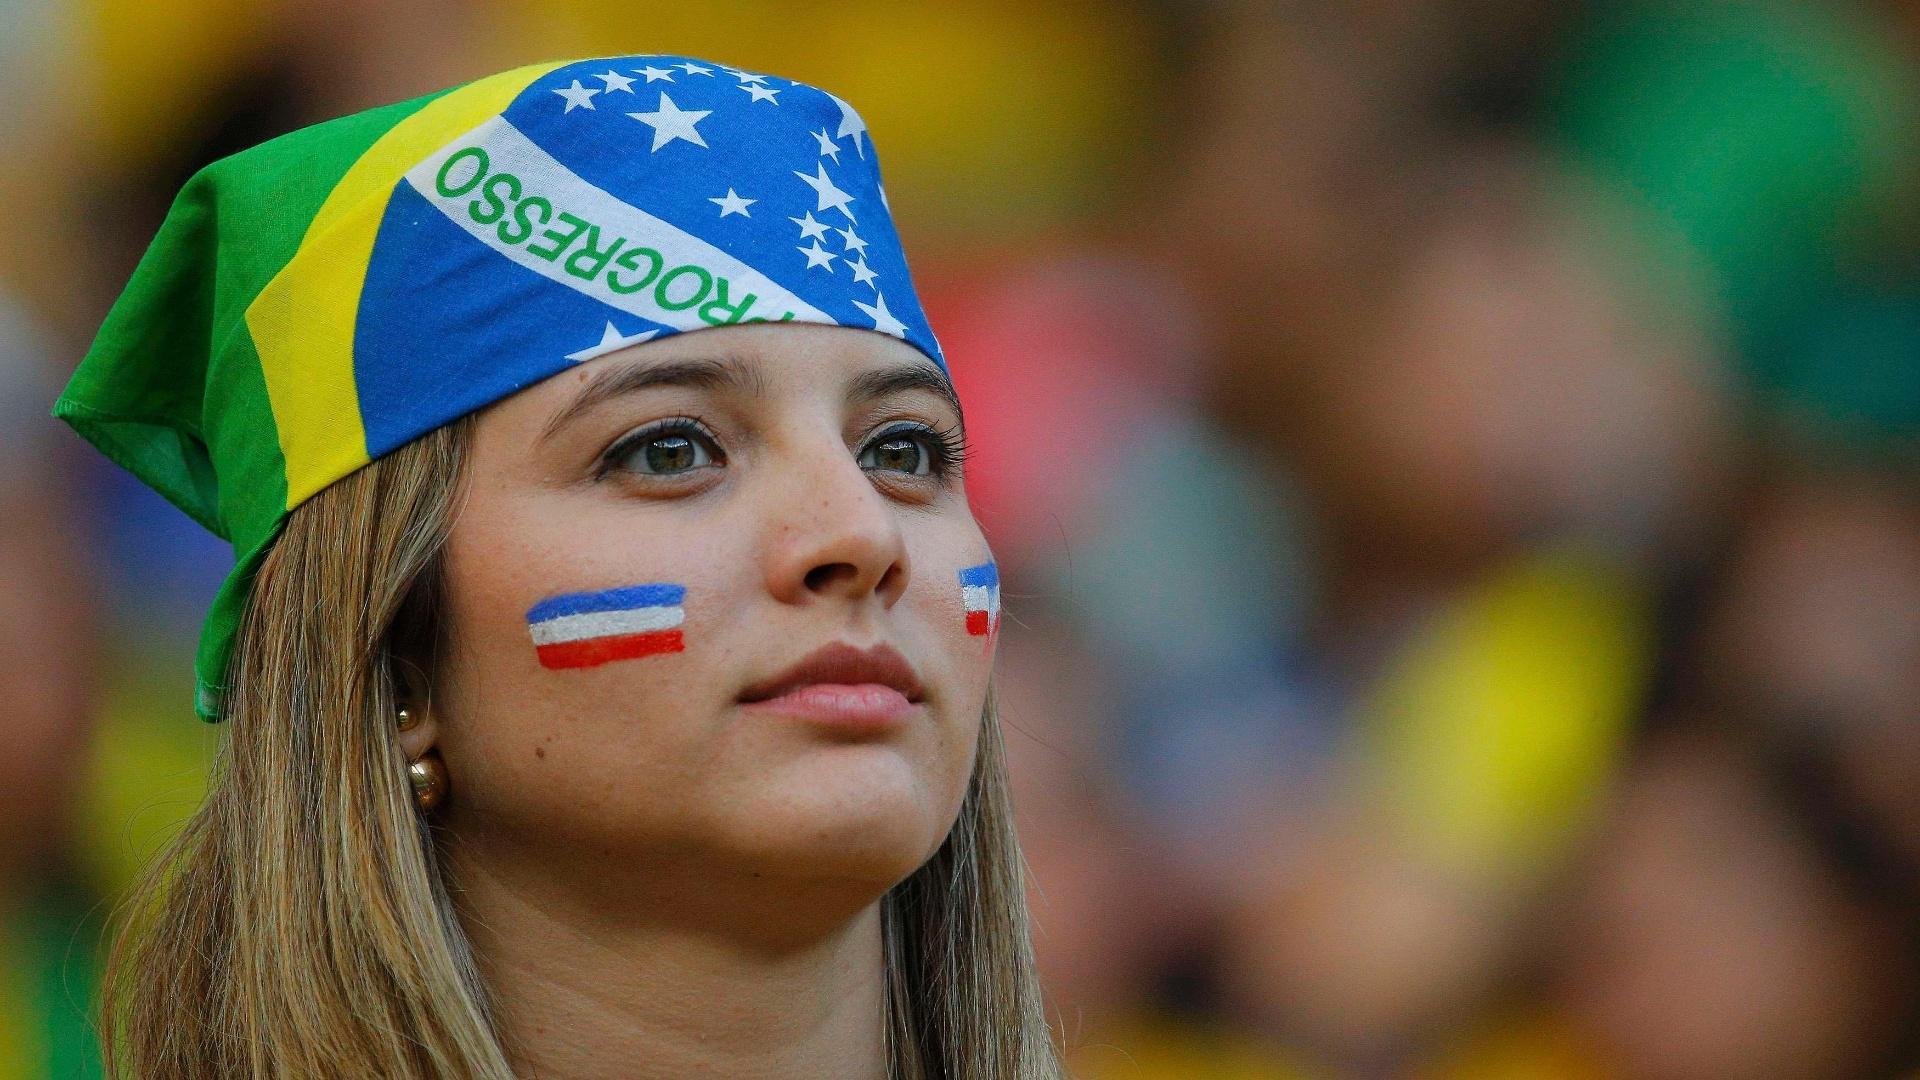 Torcedora com a bandana do Brasil pinta a bandeira da Costa Rica no rosto na Arena Pernambuco